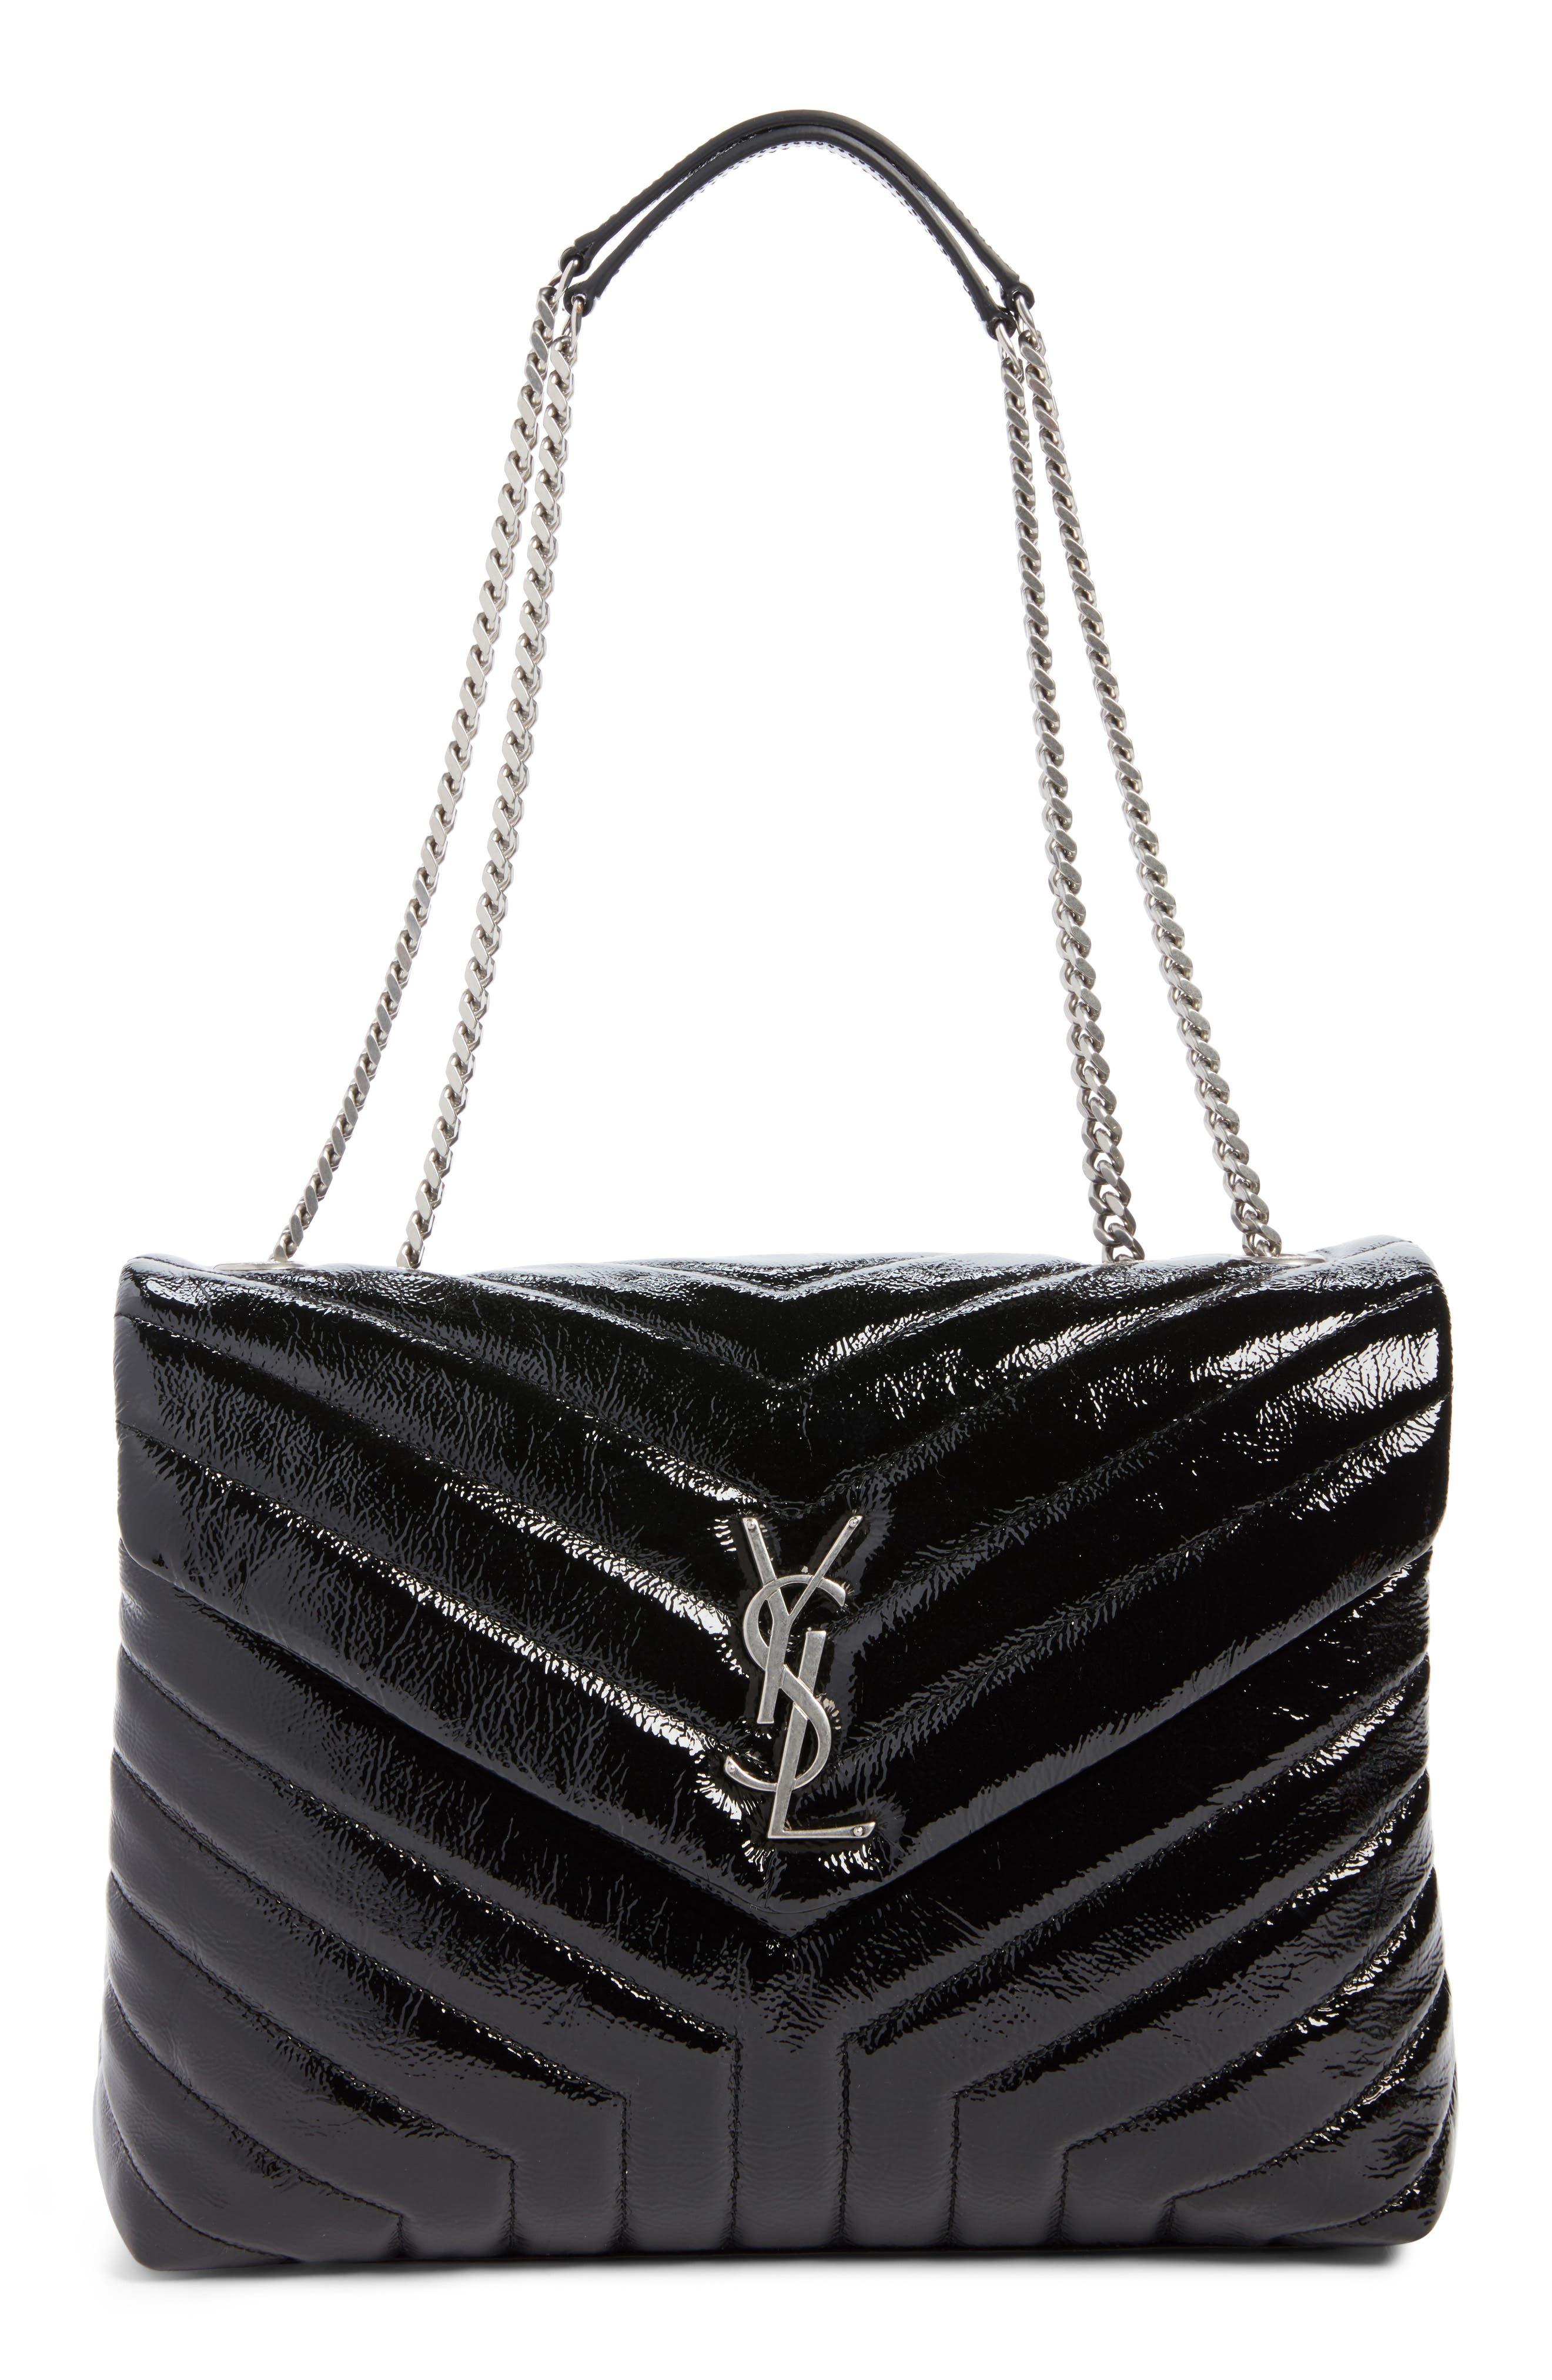 Medium Loulou Patent Leather Shoulder Bag,                         Main,                         color, 001